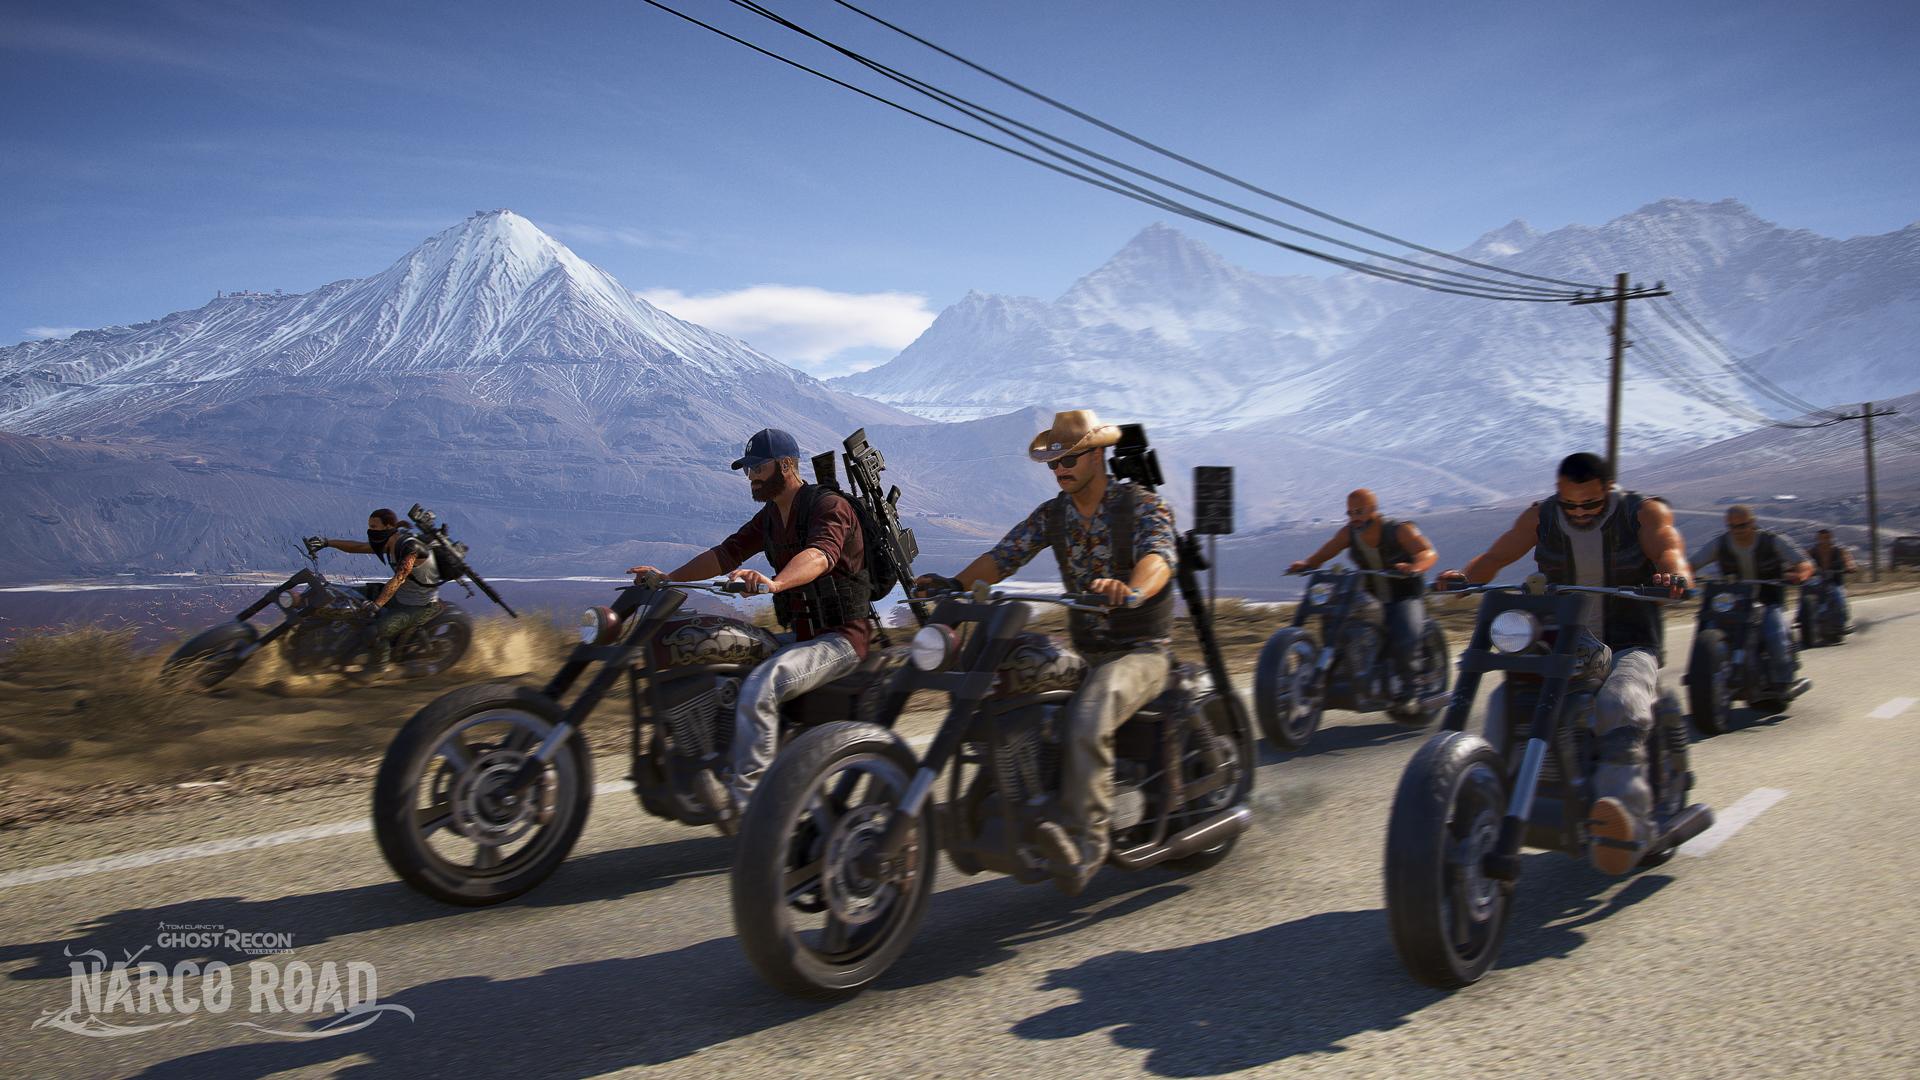 Ghost Recon Wildlands – DLC Narco Road: Release-Datum & Inhalt